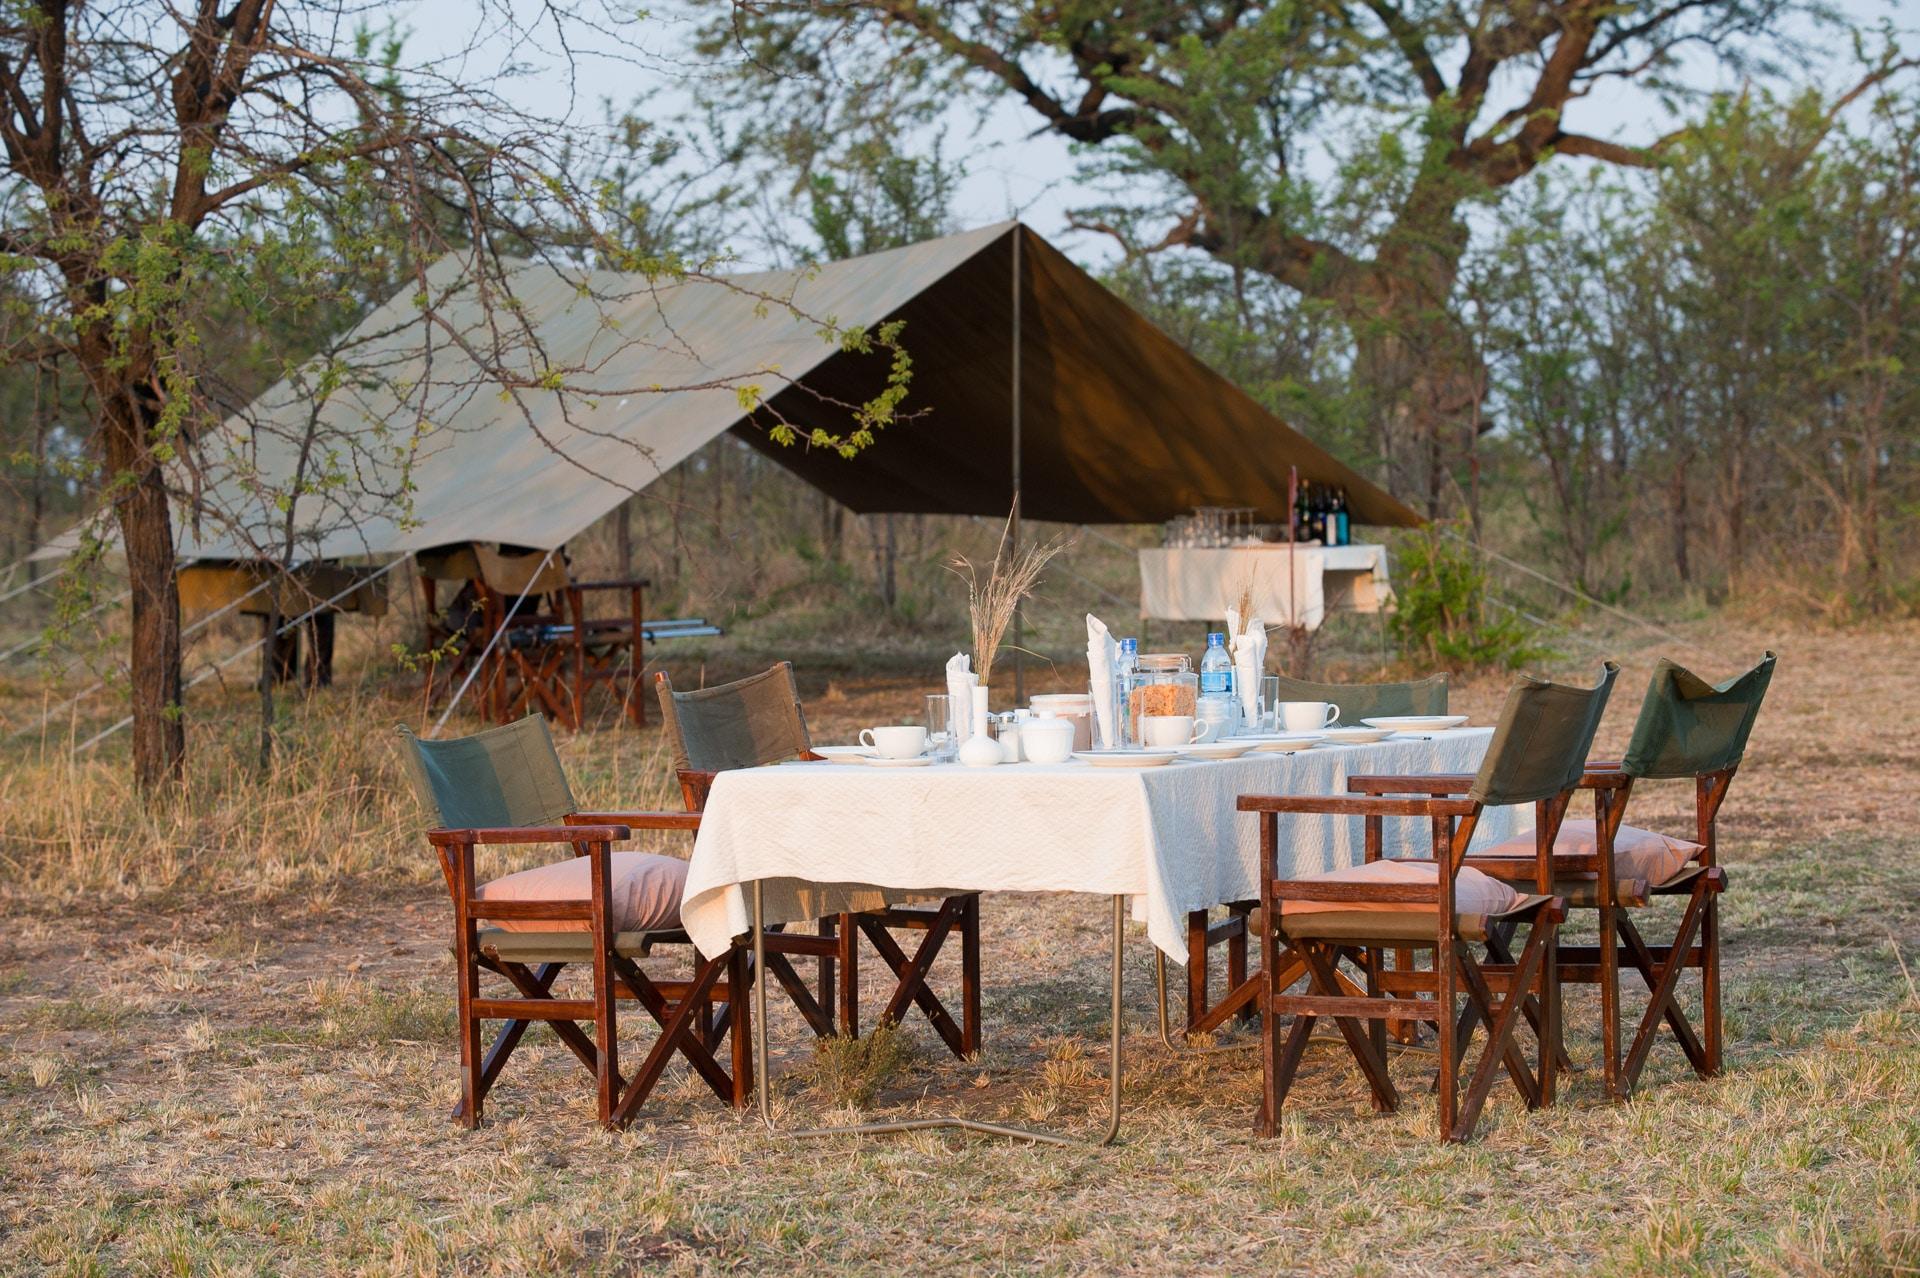 Select-Zelt-Safari-Serengeti-Tansania-Globetrotter-Select-GLenz-15